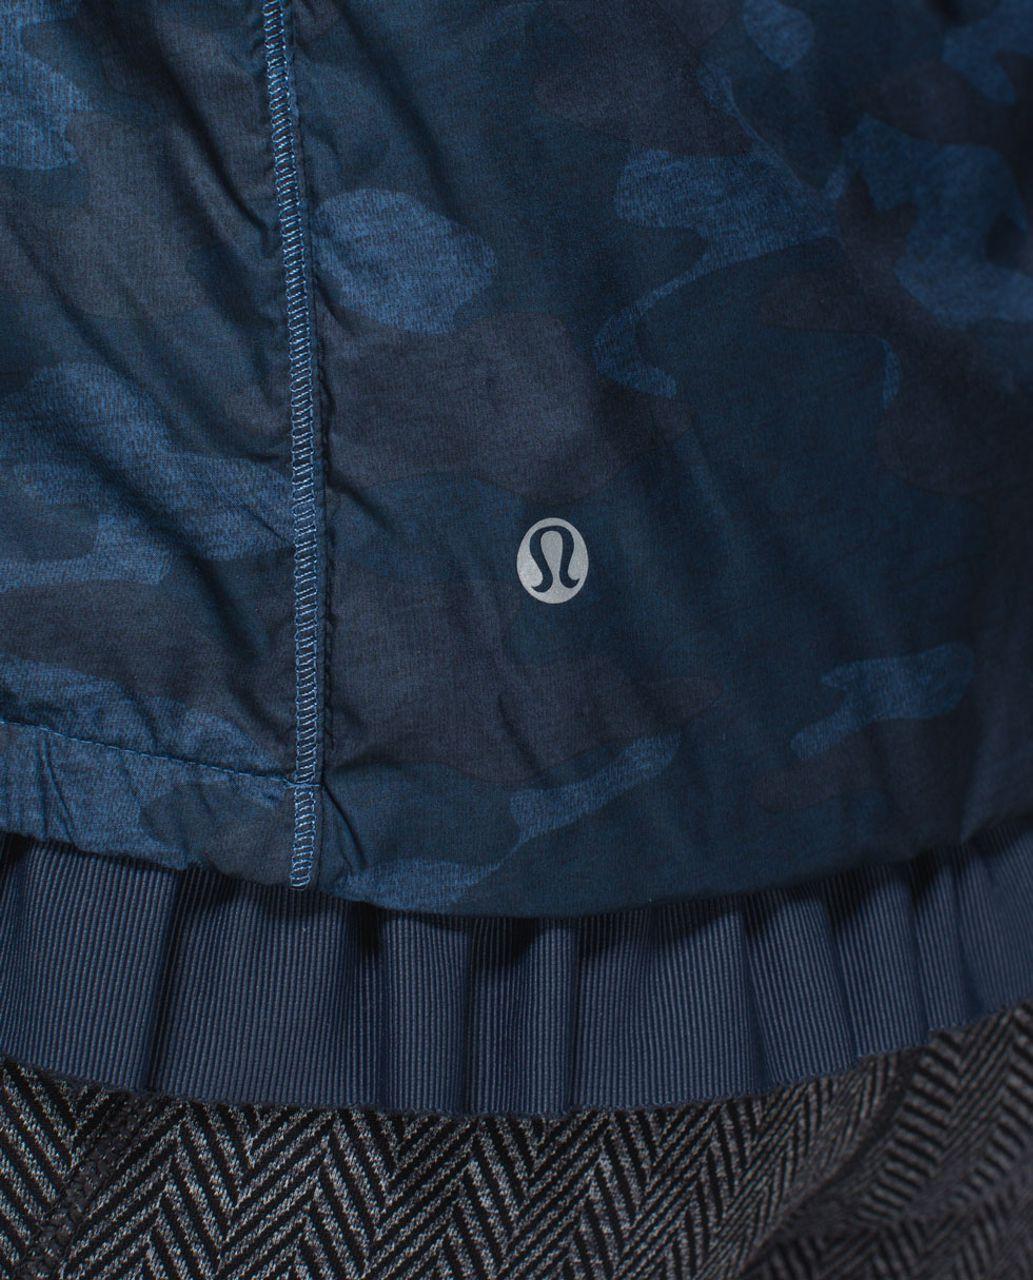 Lululemon Spring Fling Puffy Windbreaker - Heathered Texture Lotus Camo Oil Slick Blue